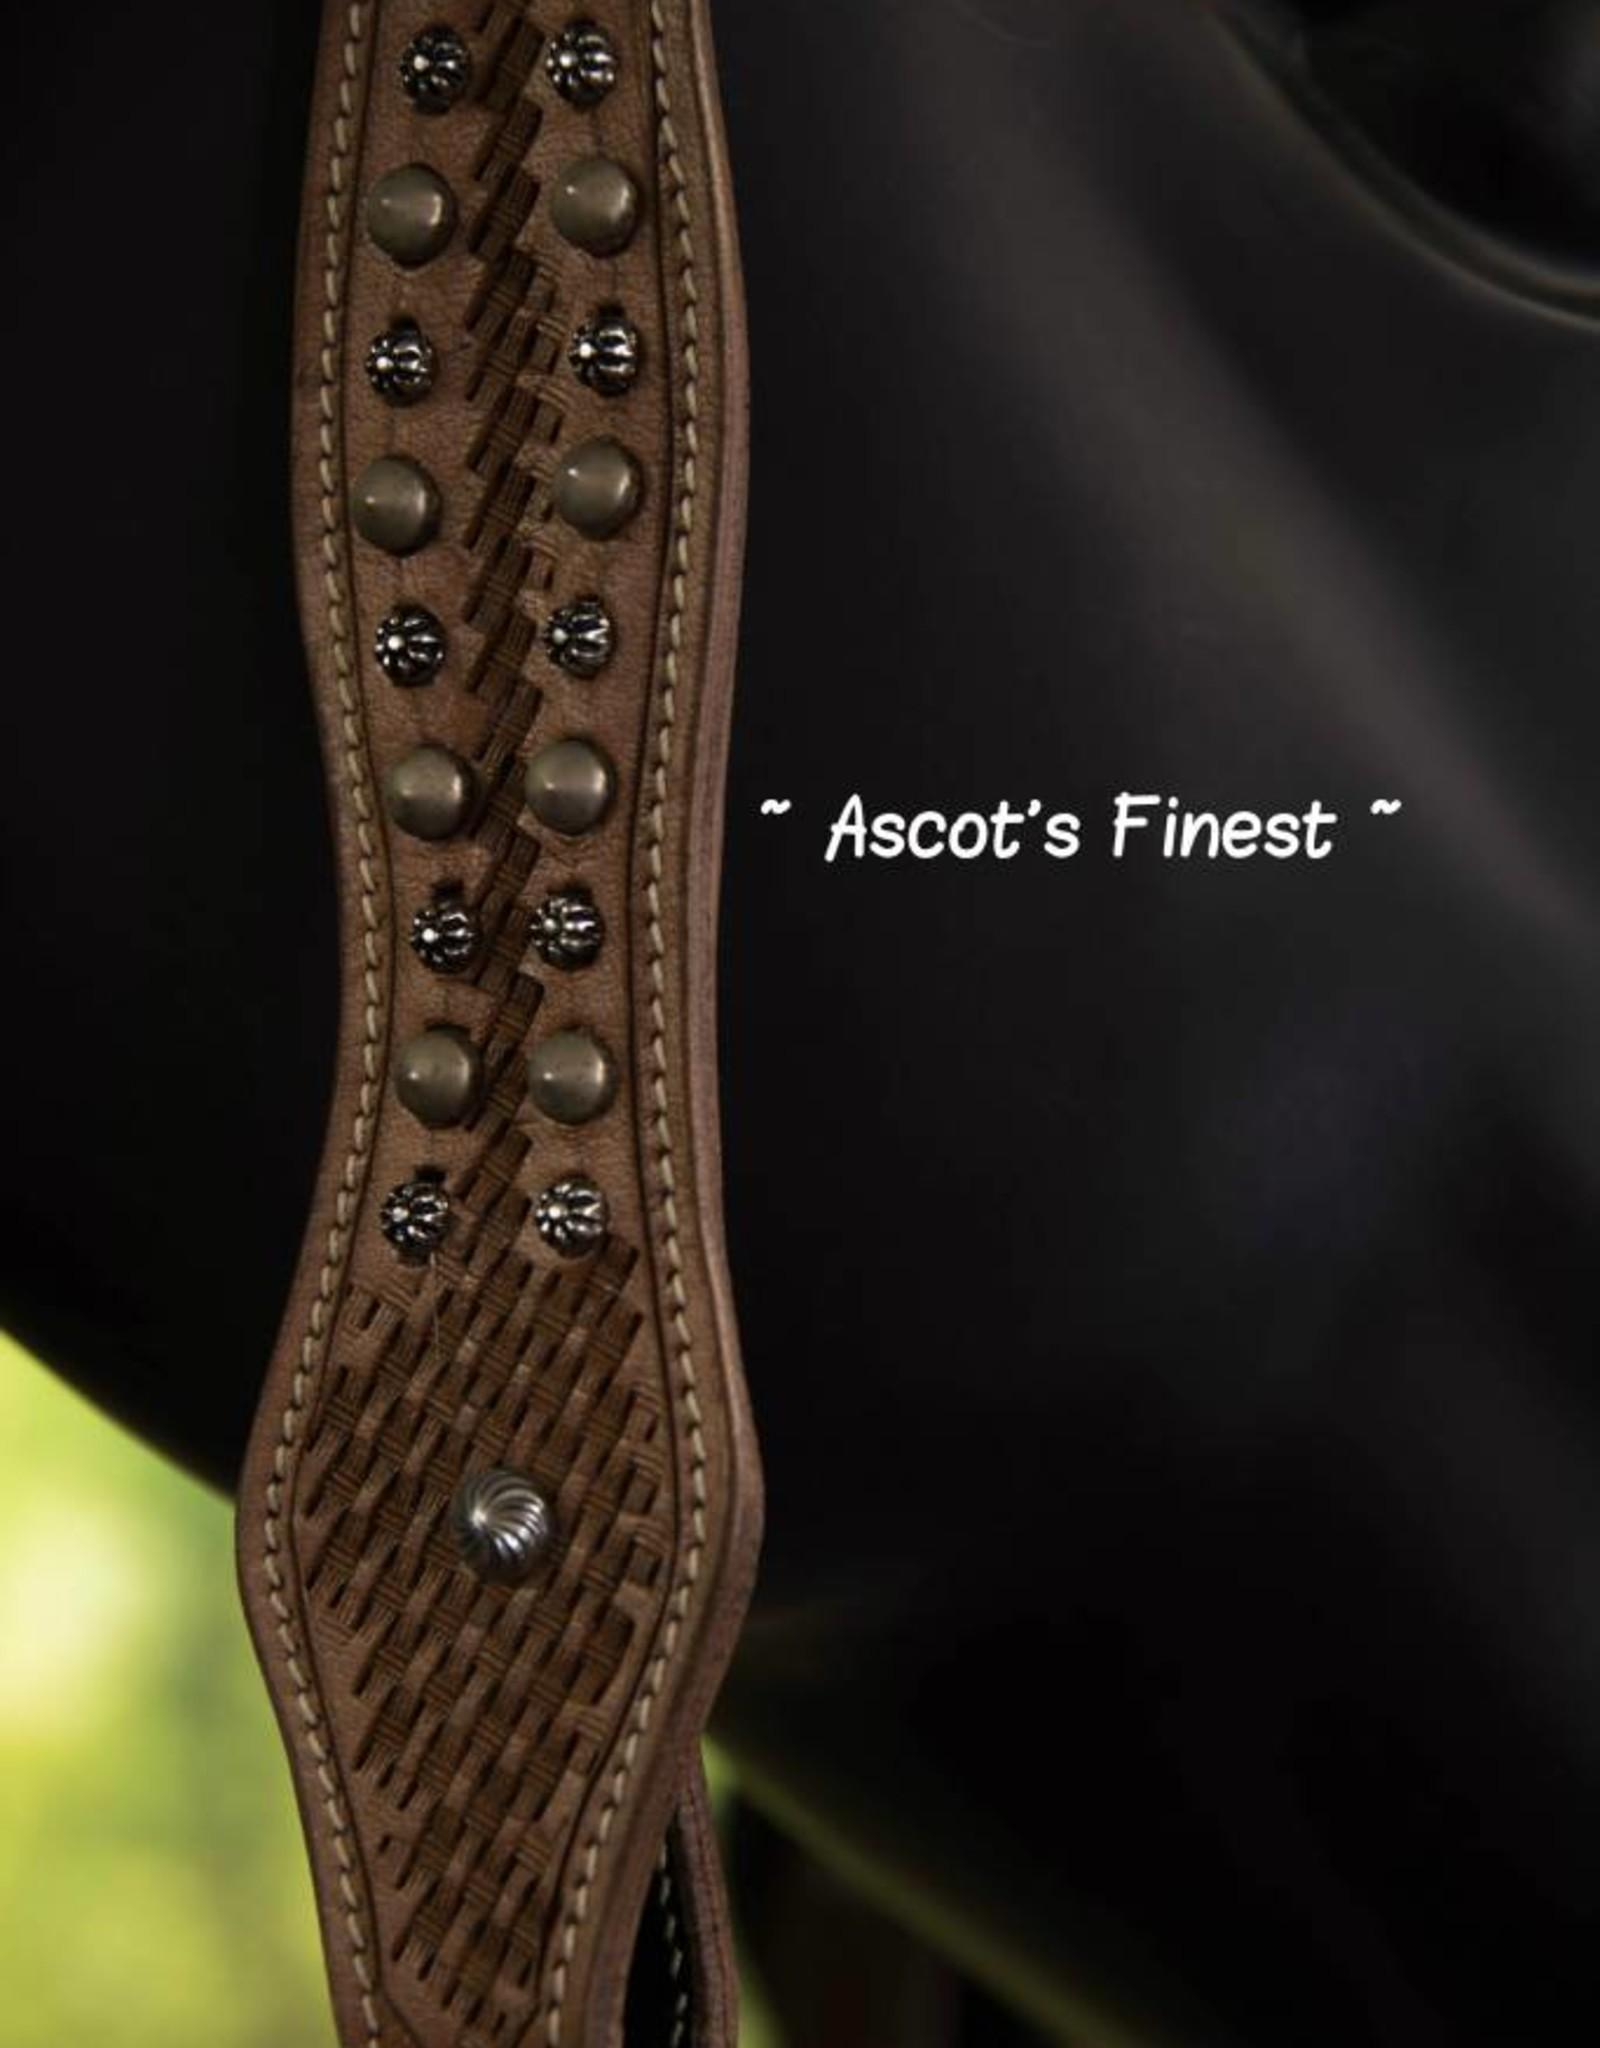 Ascot's Finest Western Hoofdstel met studs - Maat Full - #023